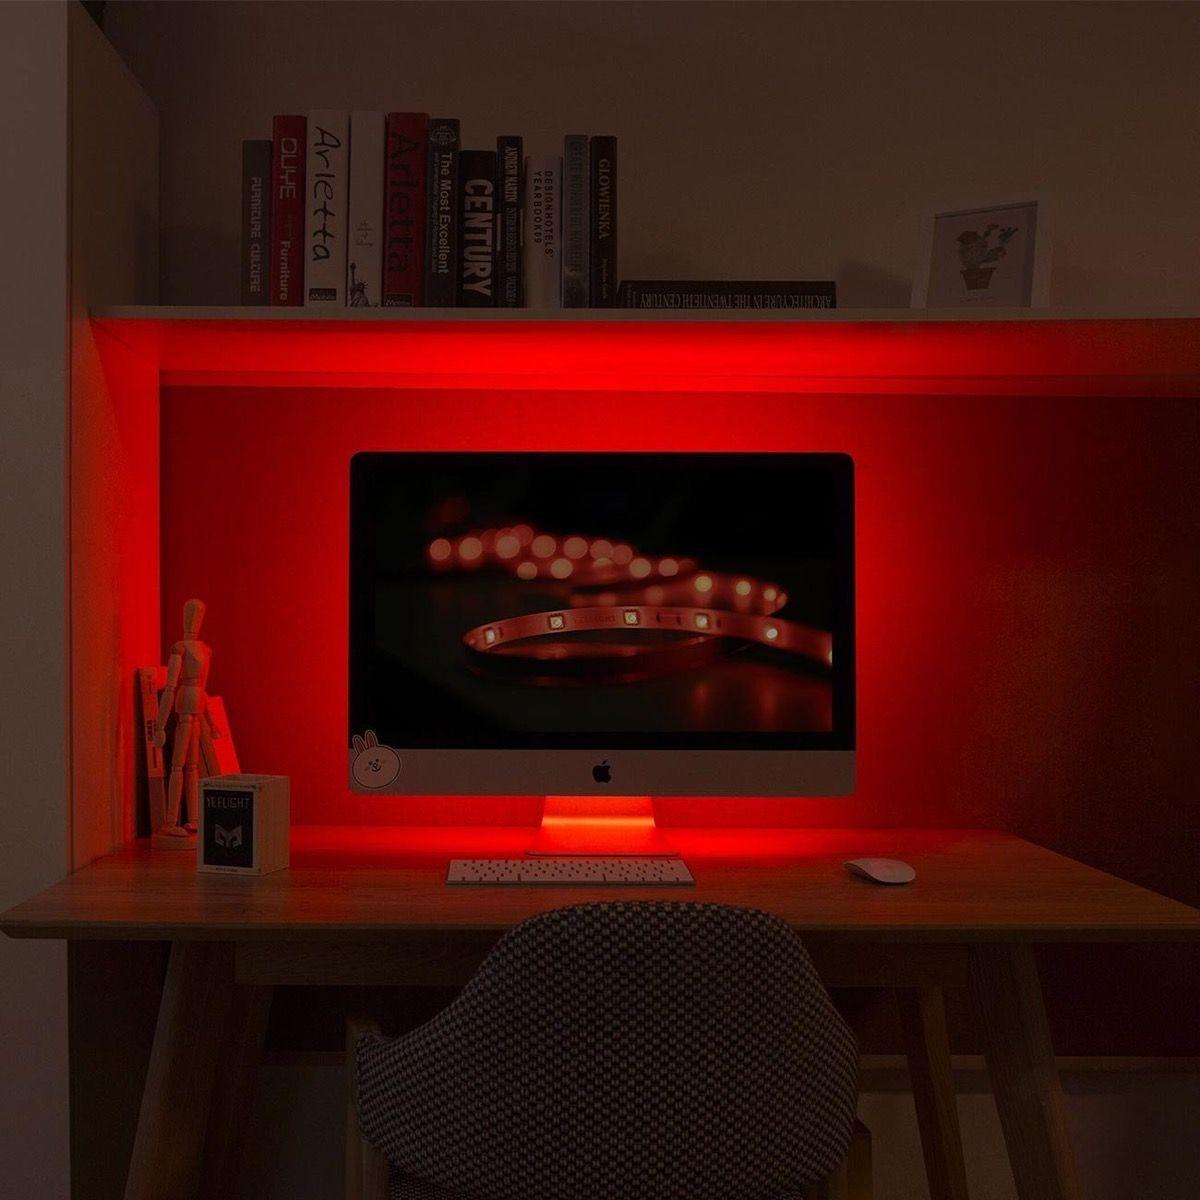 Product Of The Week Smart Led Light Strips For Mood Lighting Mood Light Bedroom Decorating Tips Home Office Design